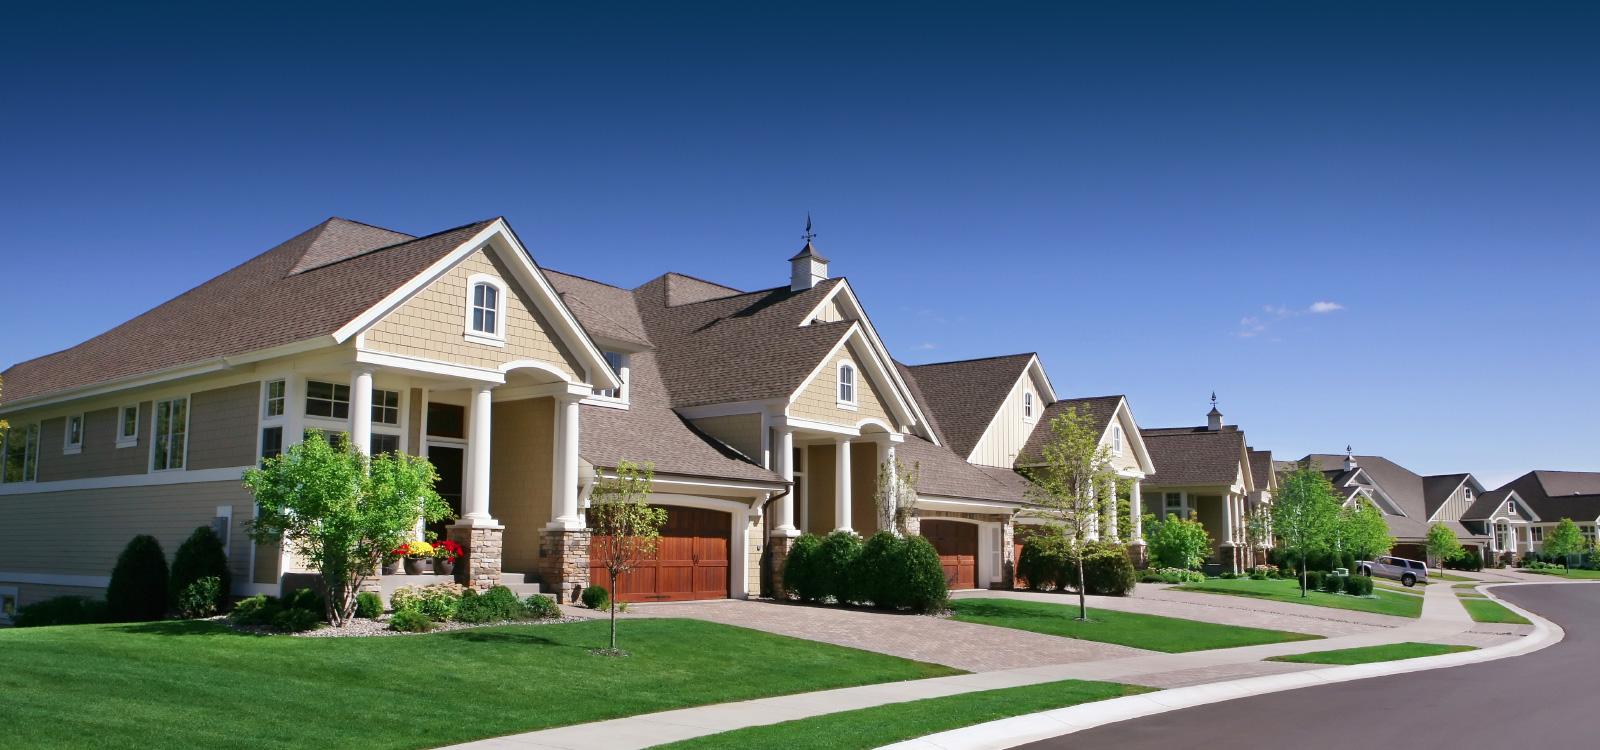 Home Inspection Checklist Rock Hill